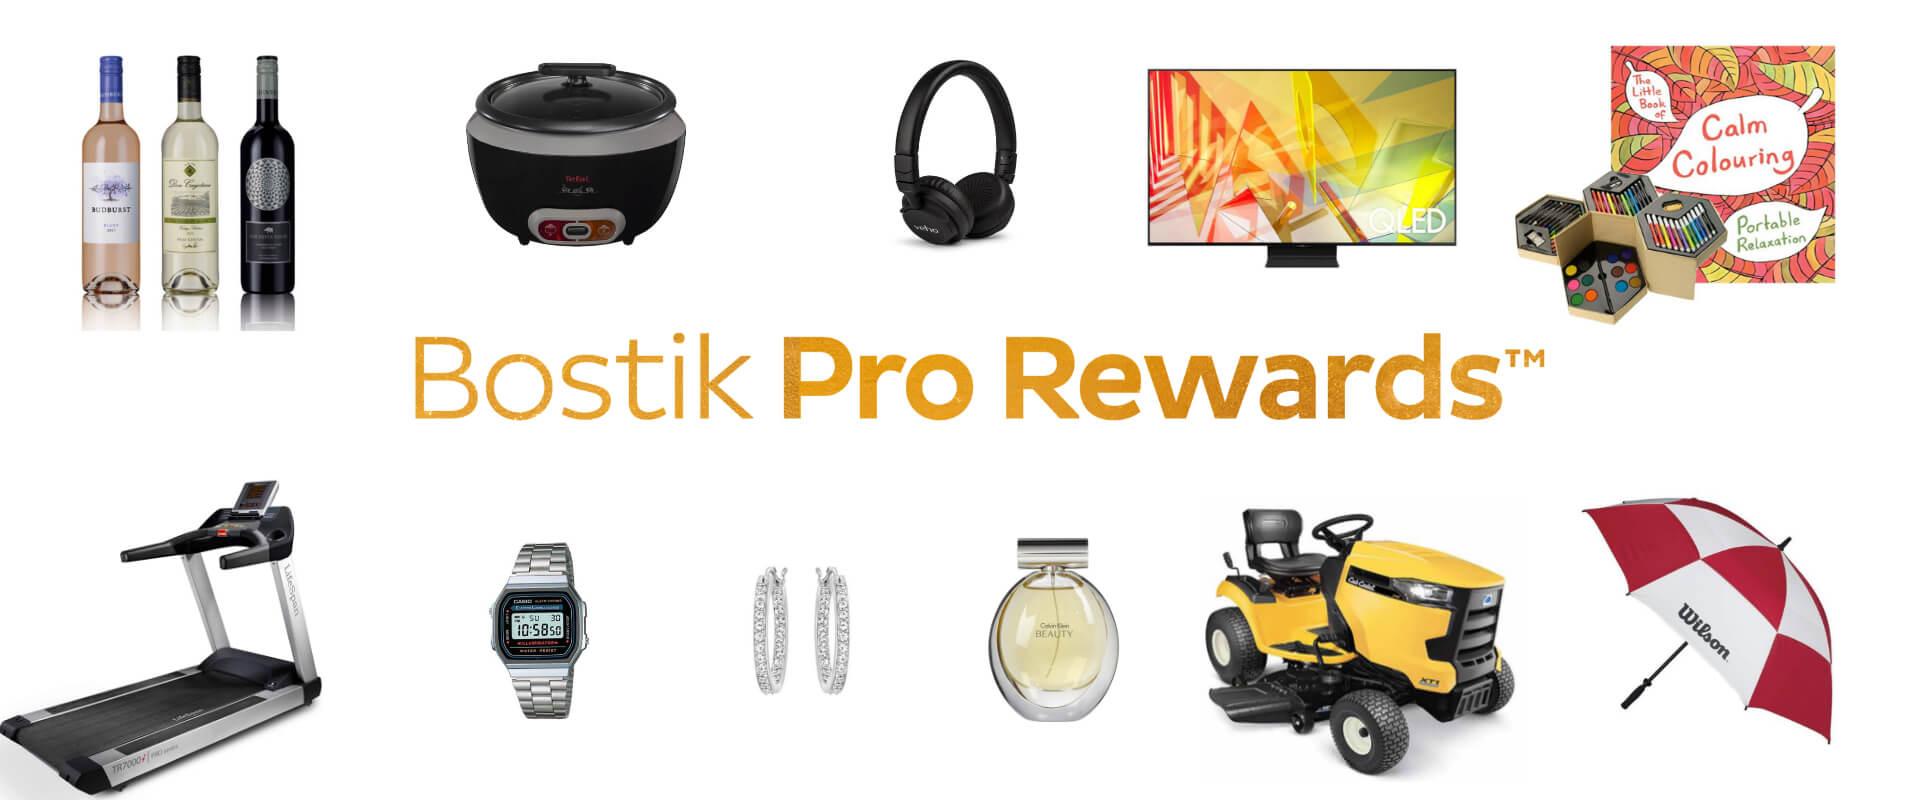 Bostik profloor rewards banner with wine tv headphones